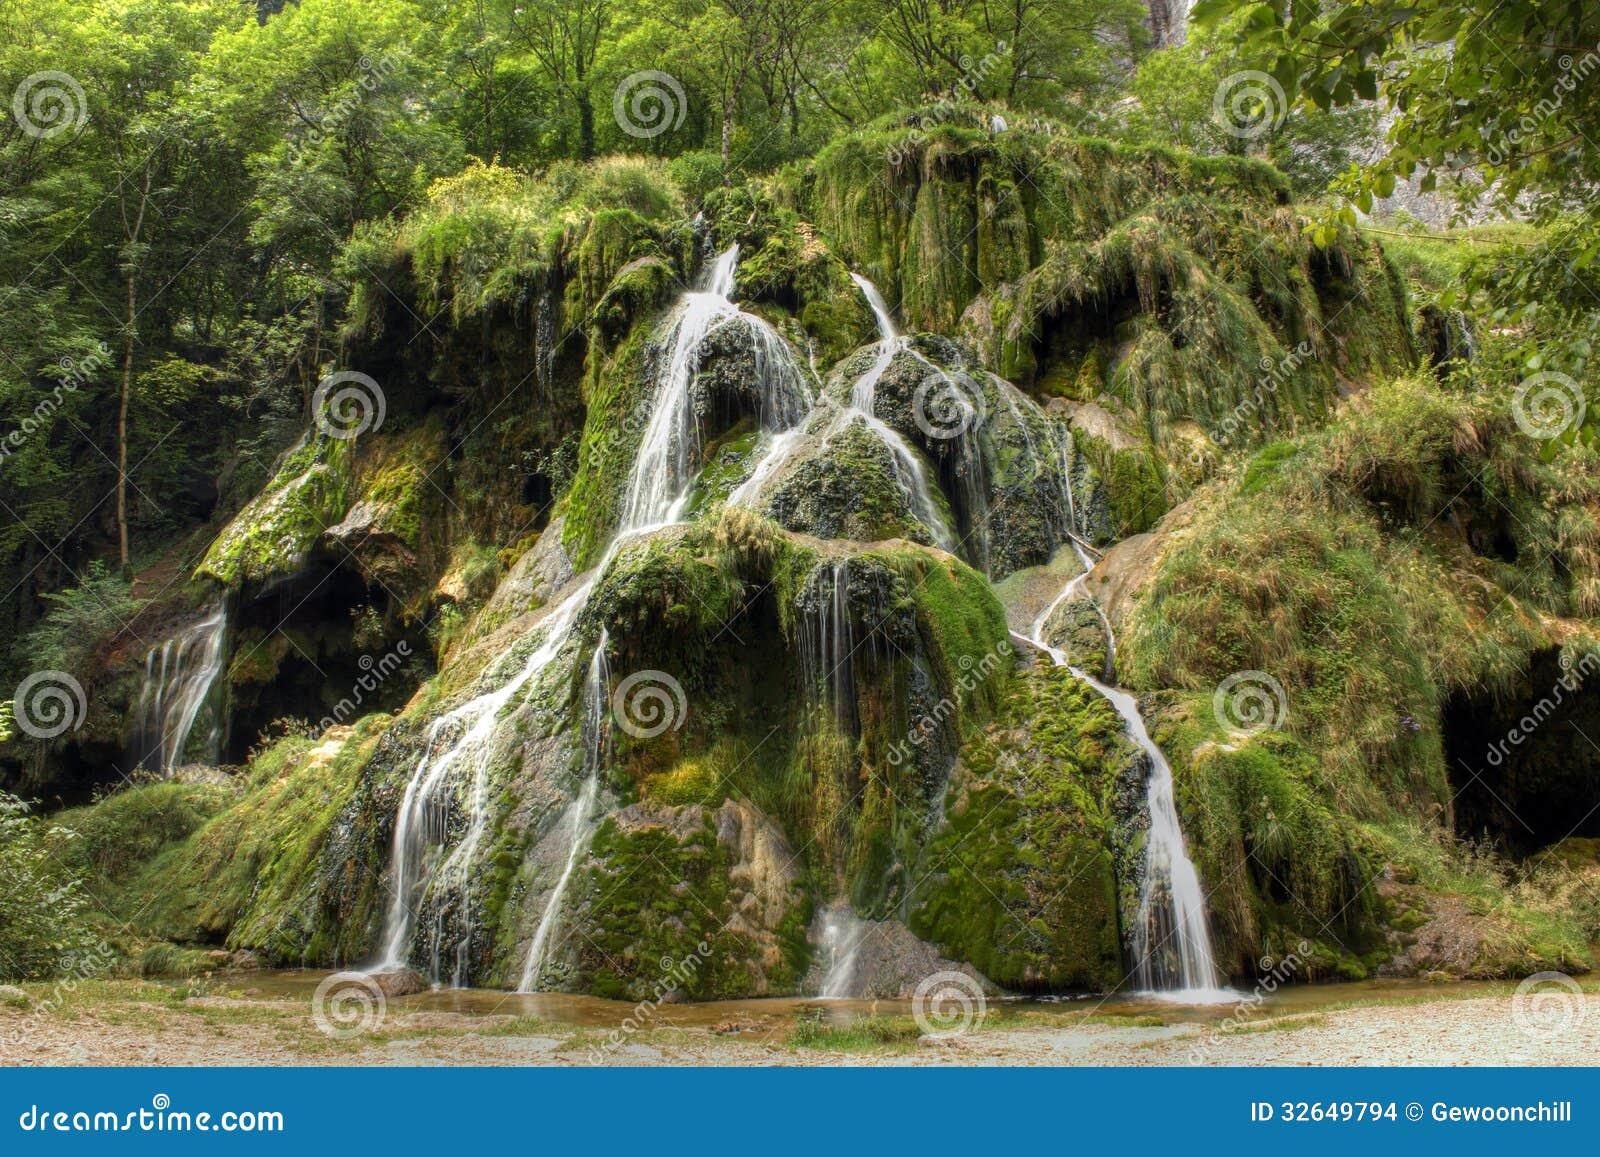 Waterfall at Baume les Messieurs, Jura - France